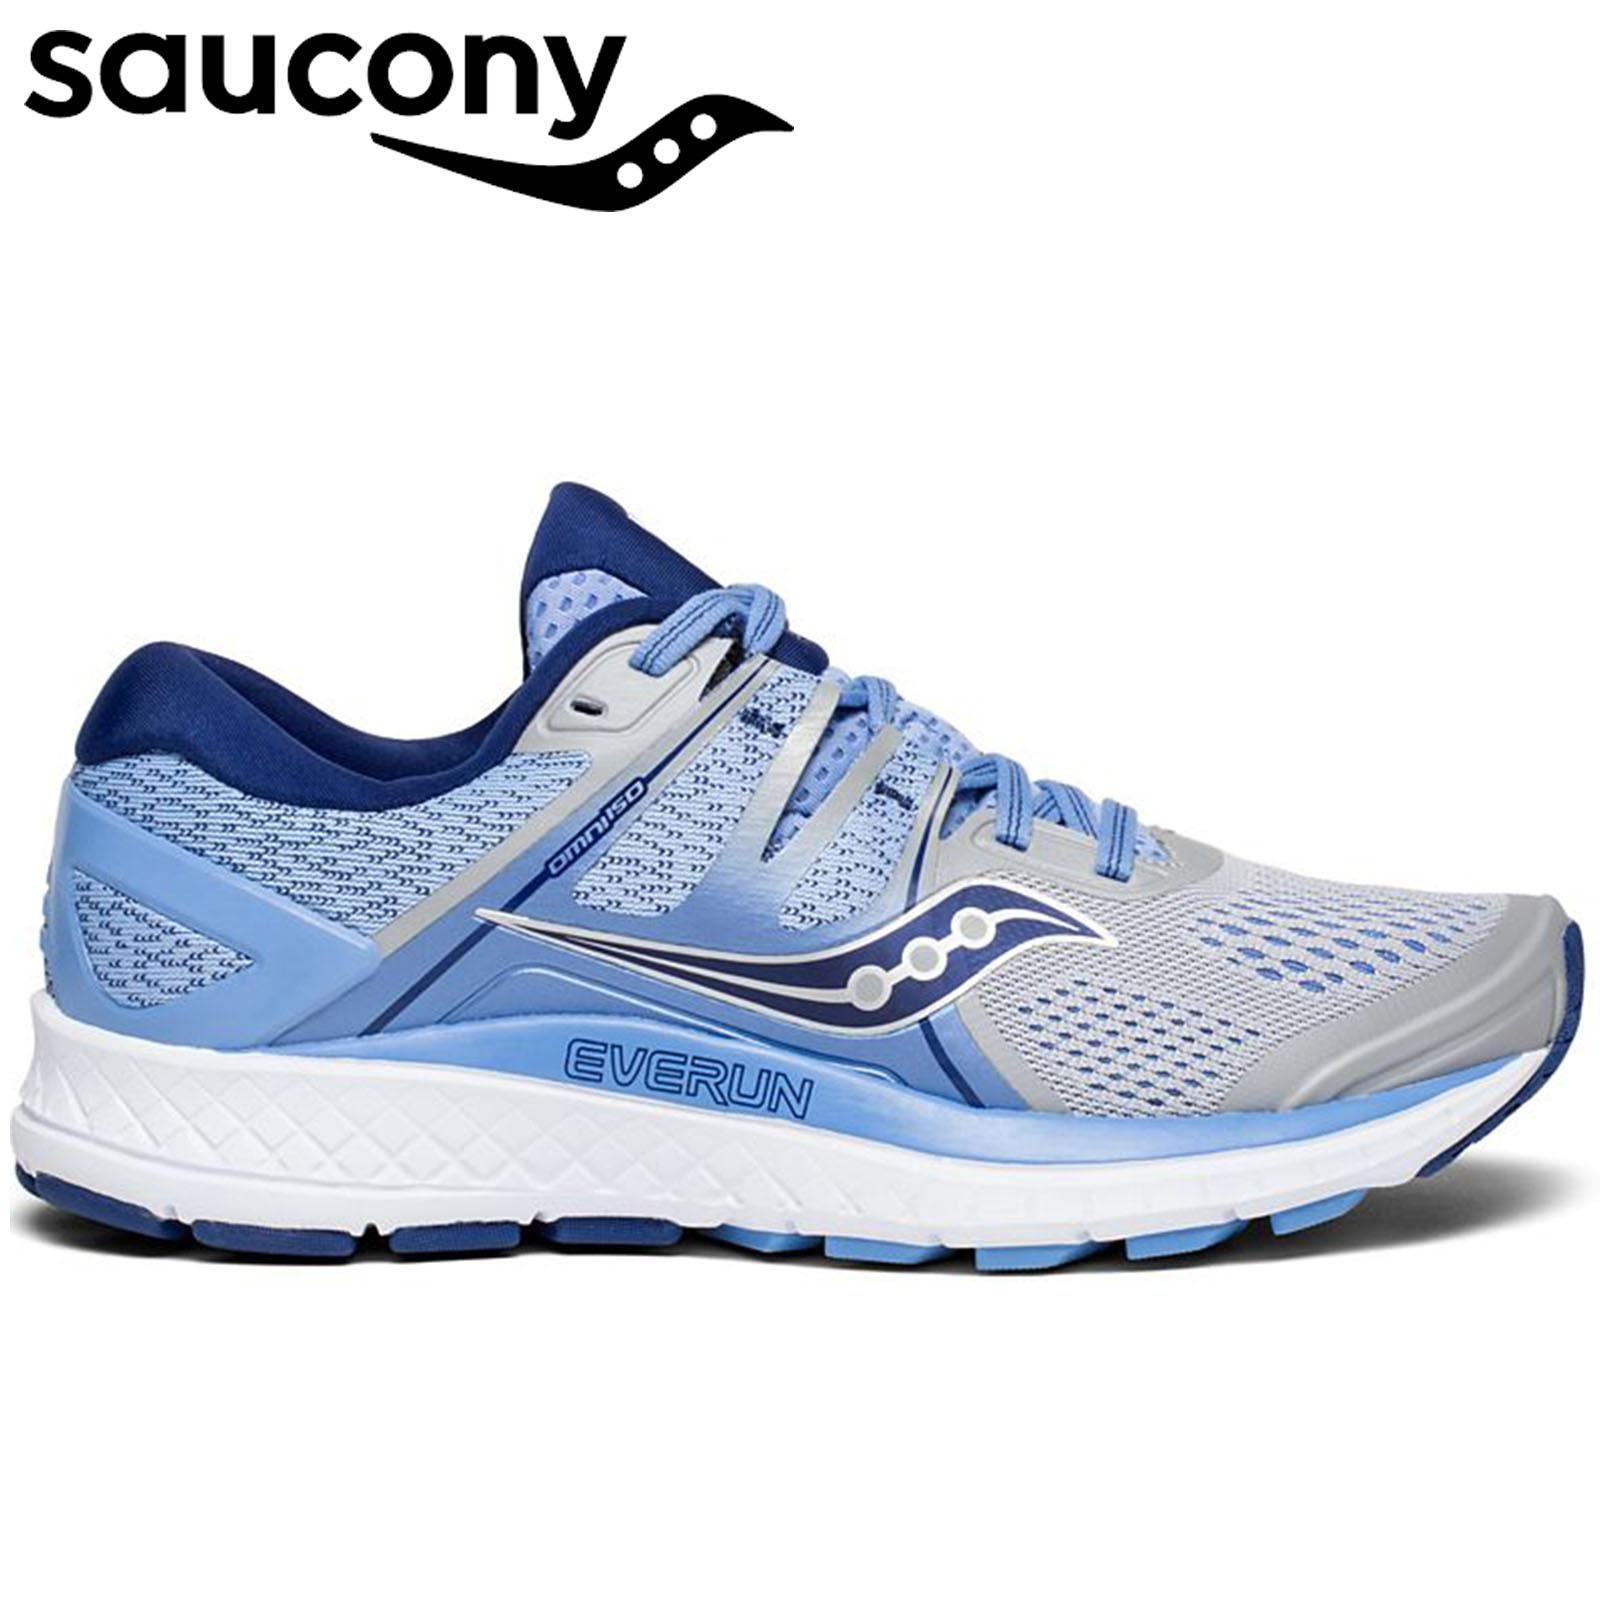 Saucony Women's Omni ISO Running